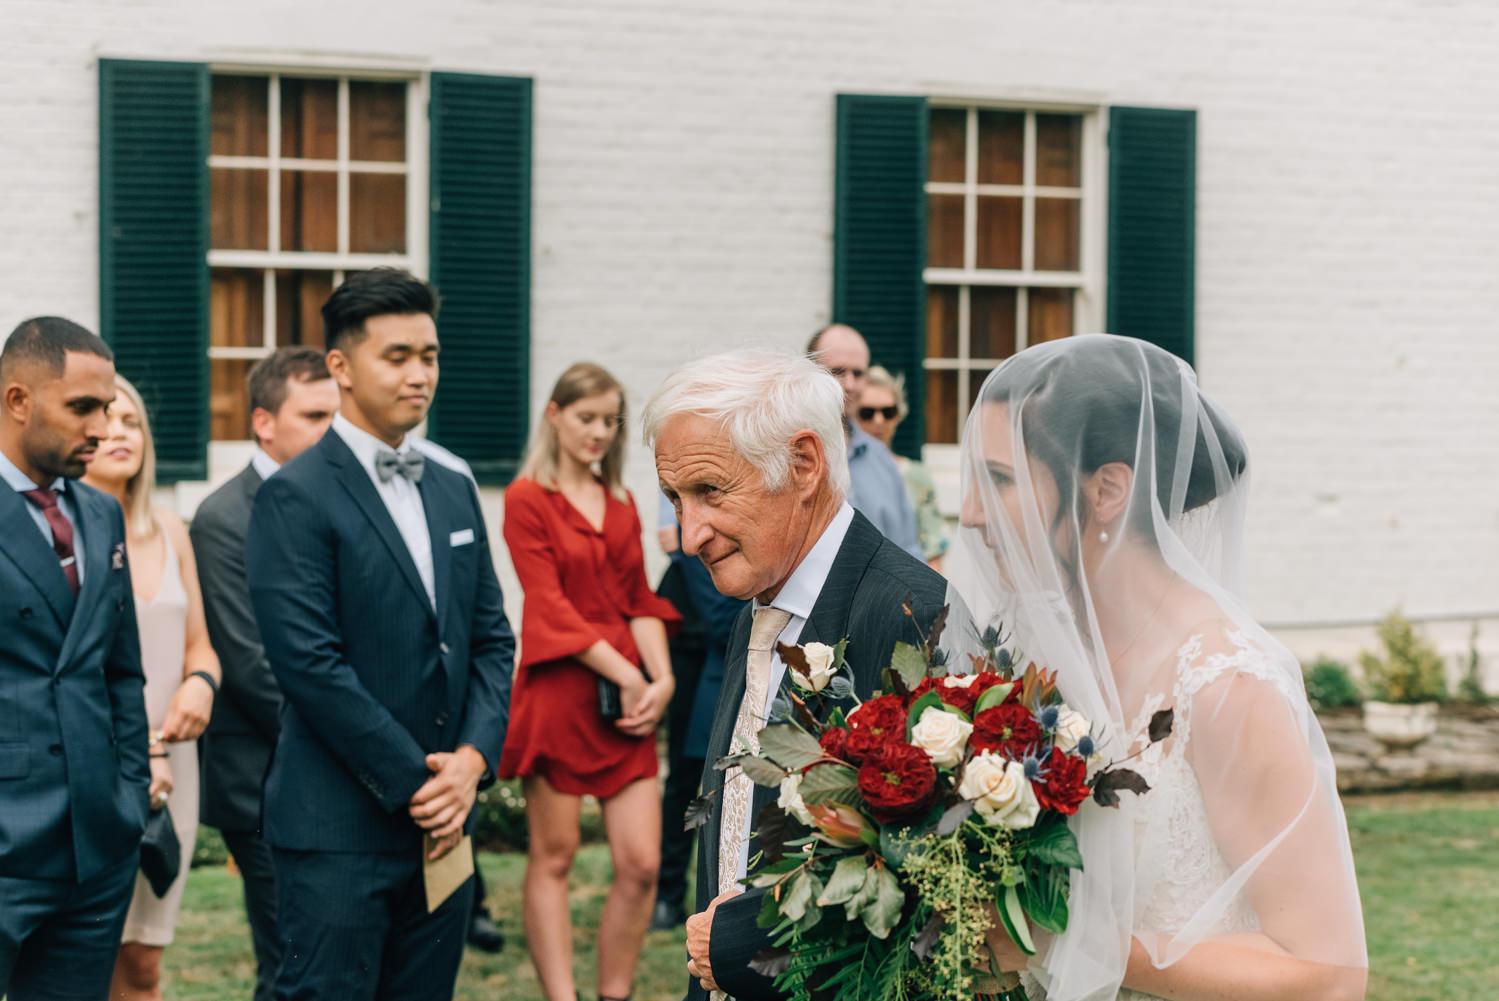 Brickendon-Wedding-Photographer-41.jpg